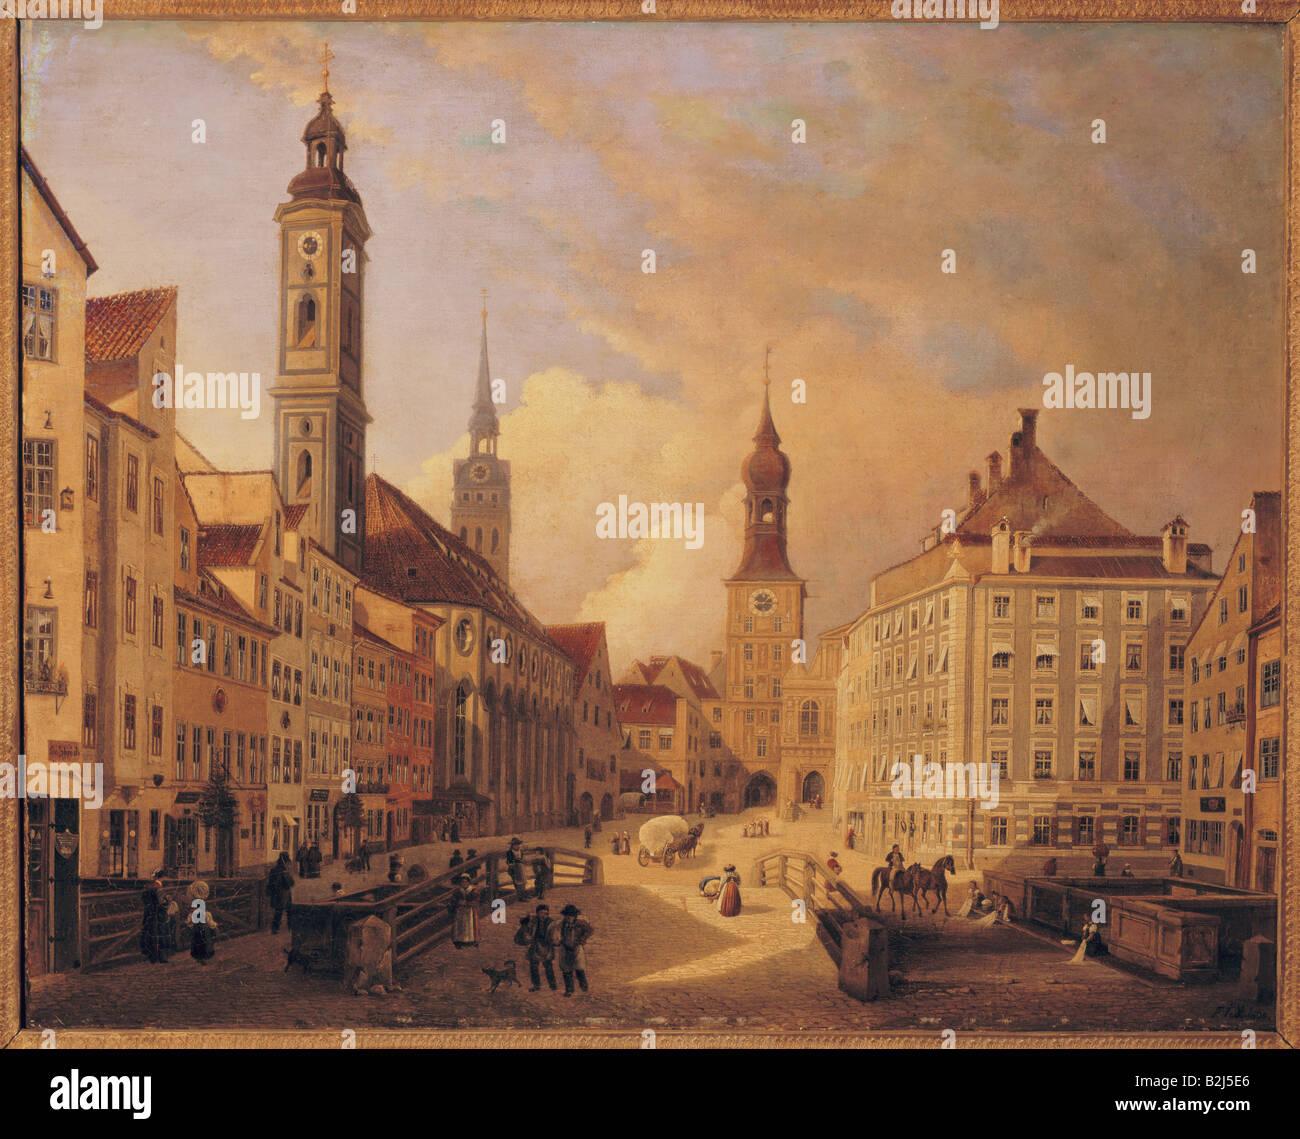 Bildende Kunst, Jodl, Ferdinand (1805 - 1882), Malerei, Tal mit hohen Brücke, Öl auf Leinwand, 1835, Stadtmuseum, Stockbild